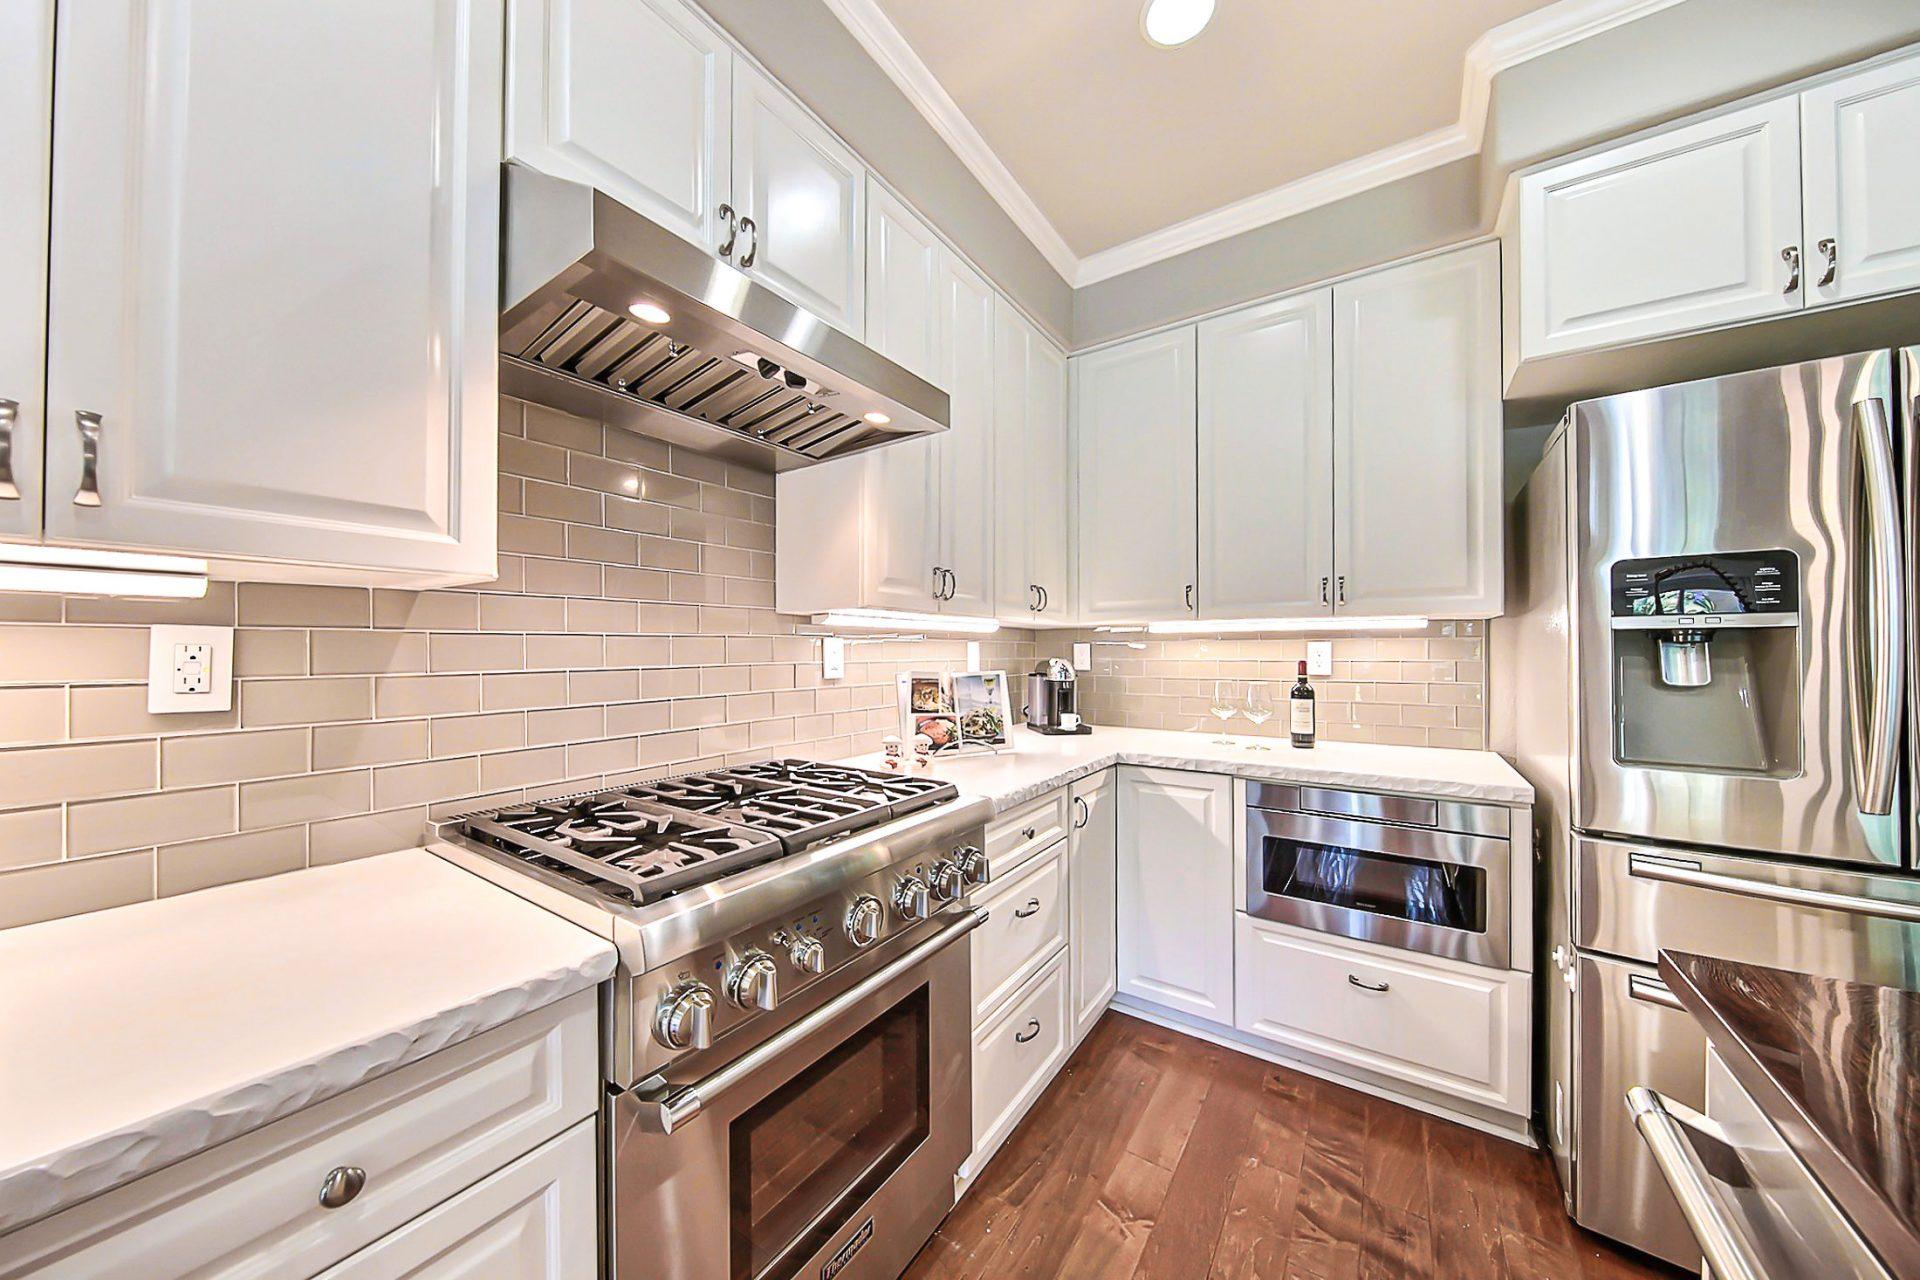 New kitchen appliances